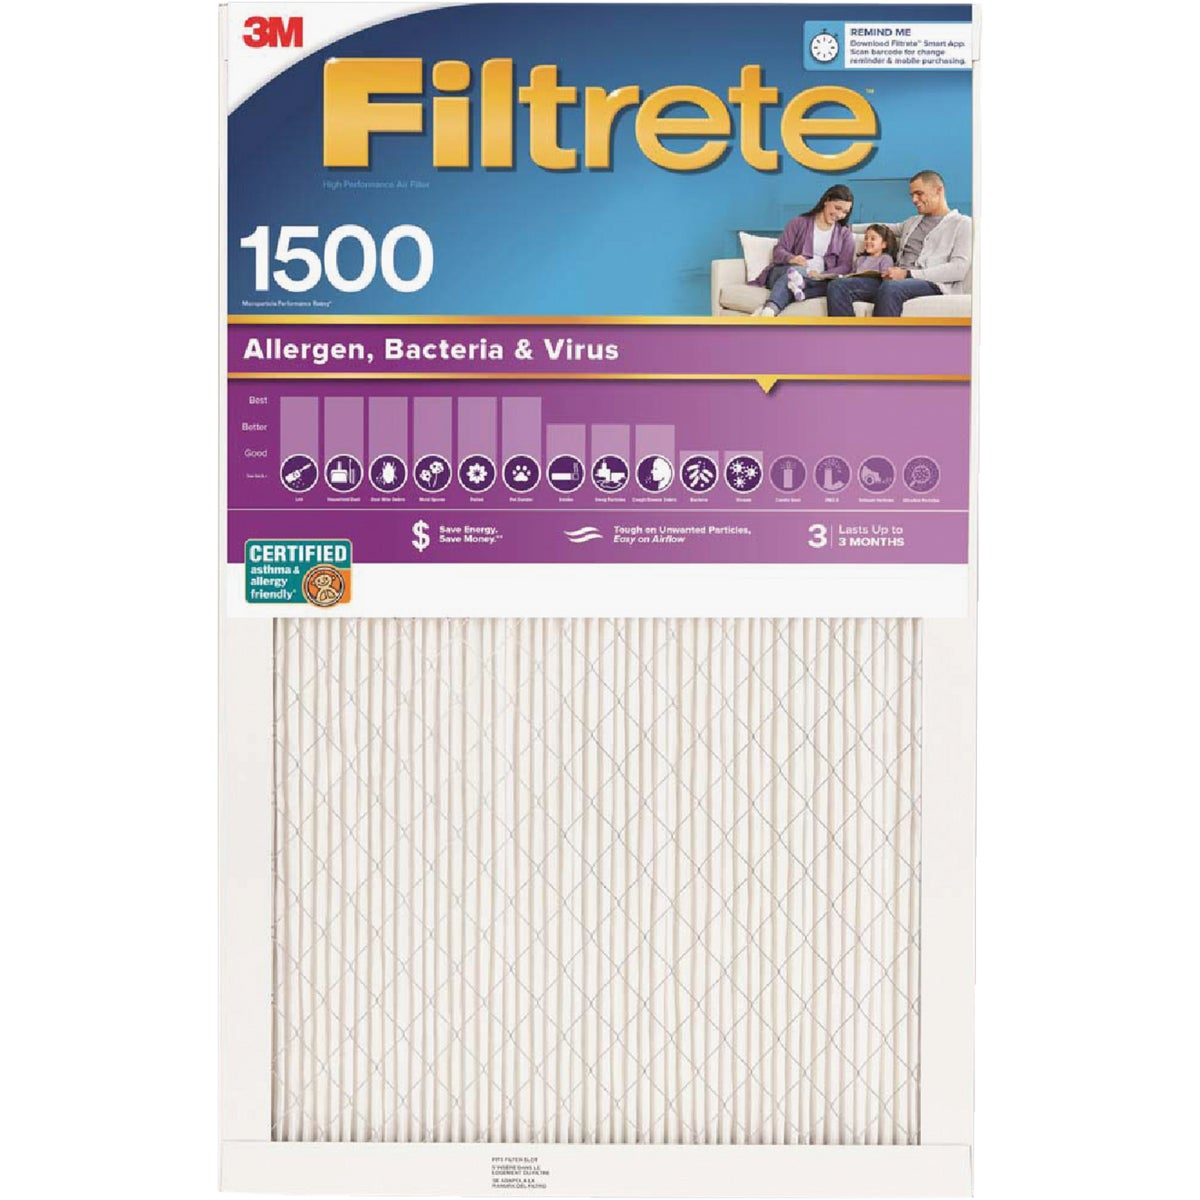 3M Filtrete 14 In. x 20 In. x 1 In. Ultra Allergen Healthy Living 1550 MPR Furnace Filter